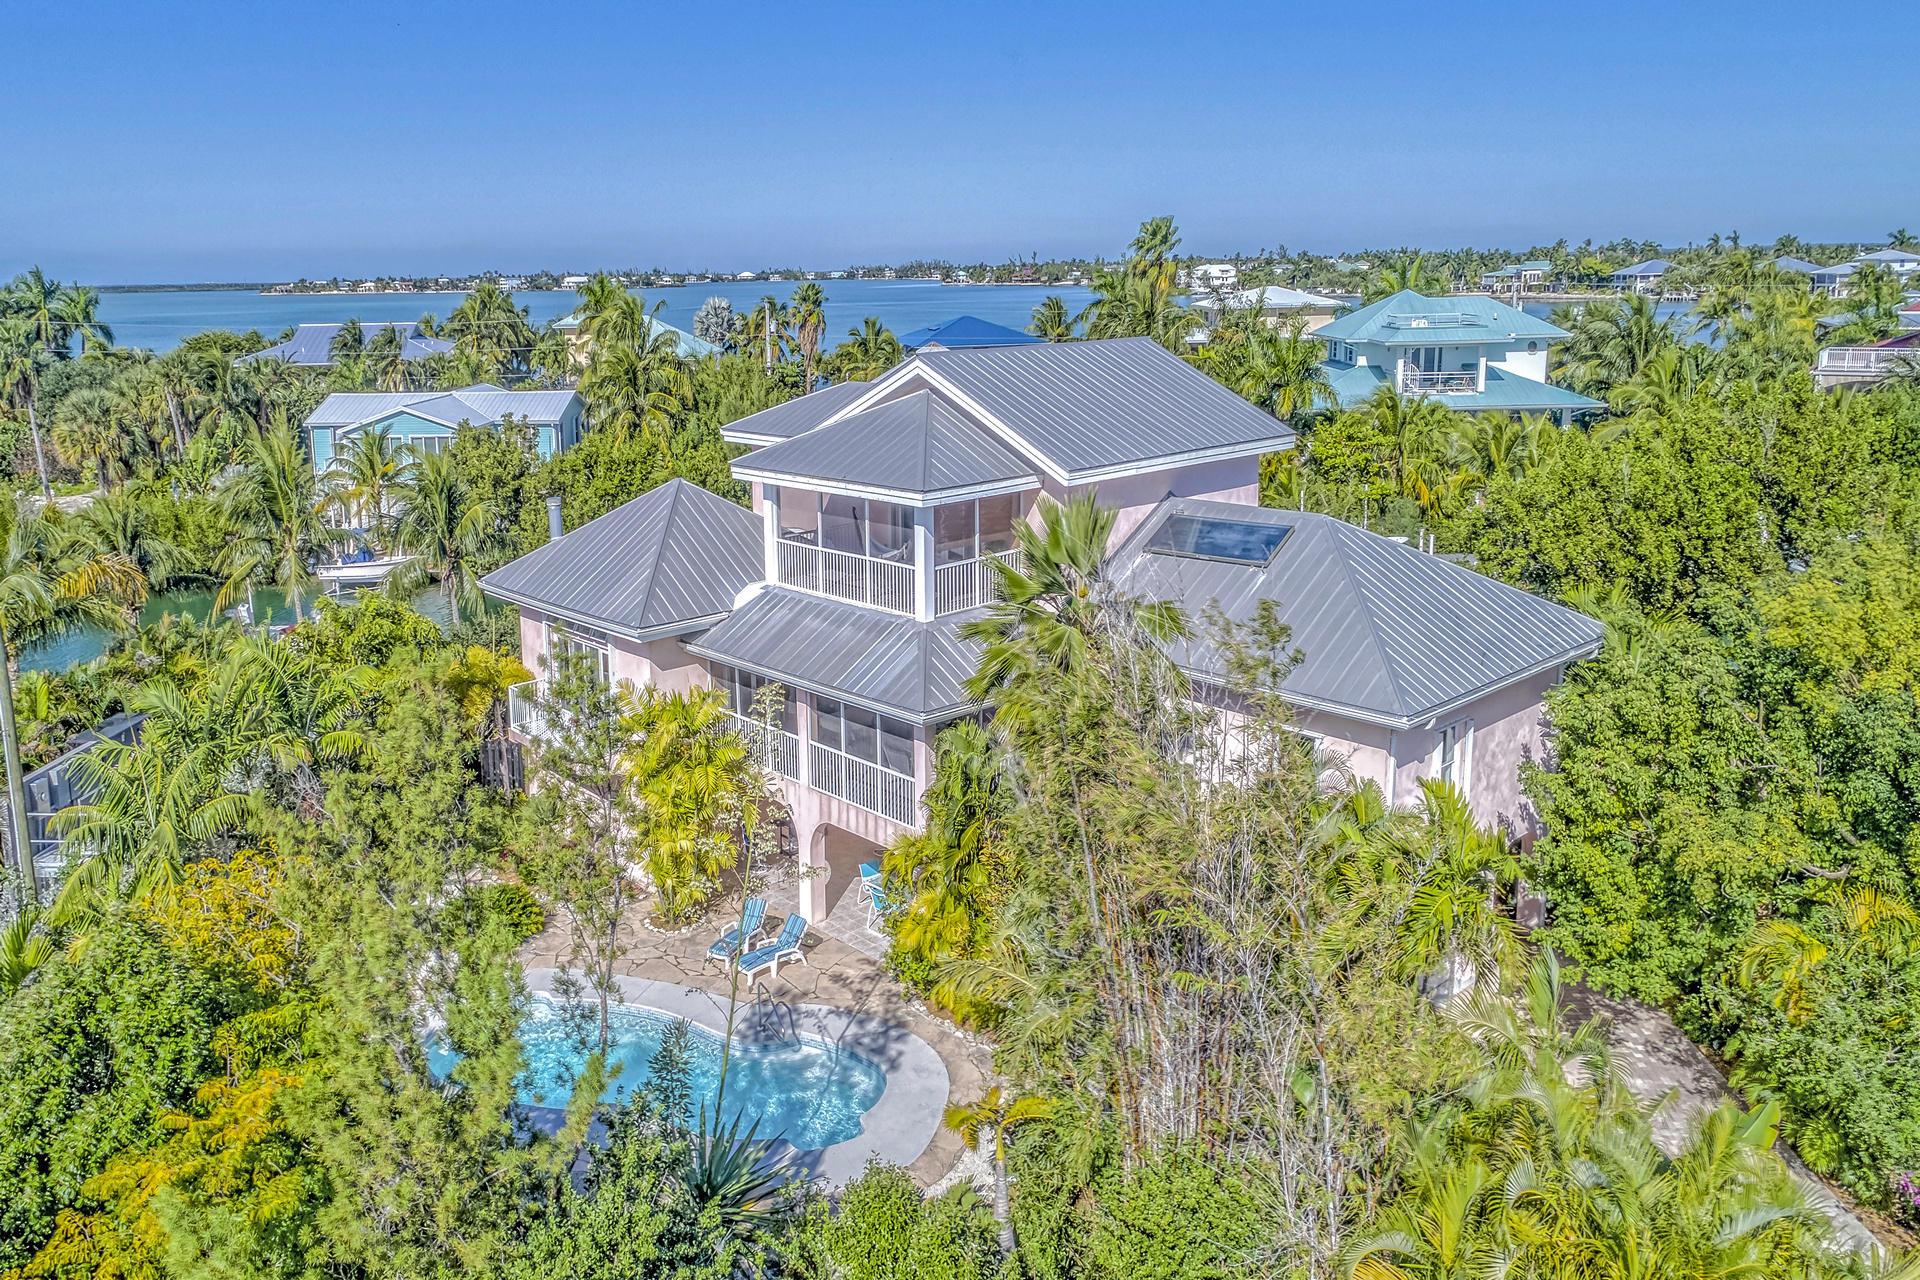 Photo of 17033 Coral Drive, Sugarloaf, FL 33042